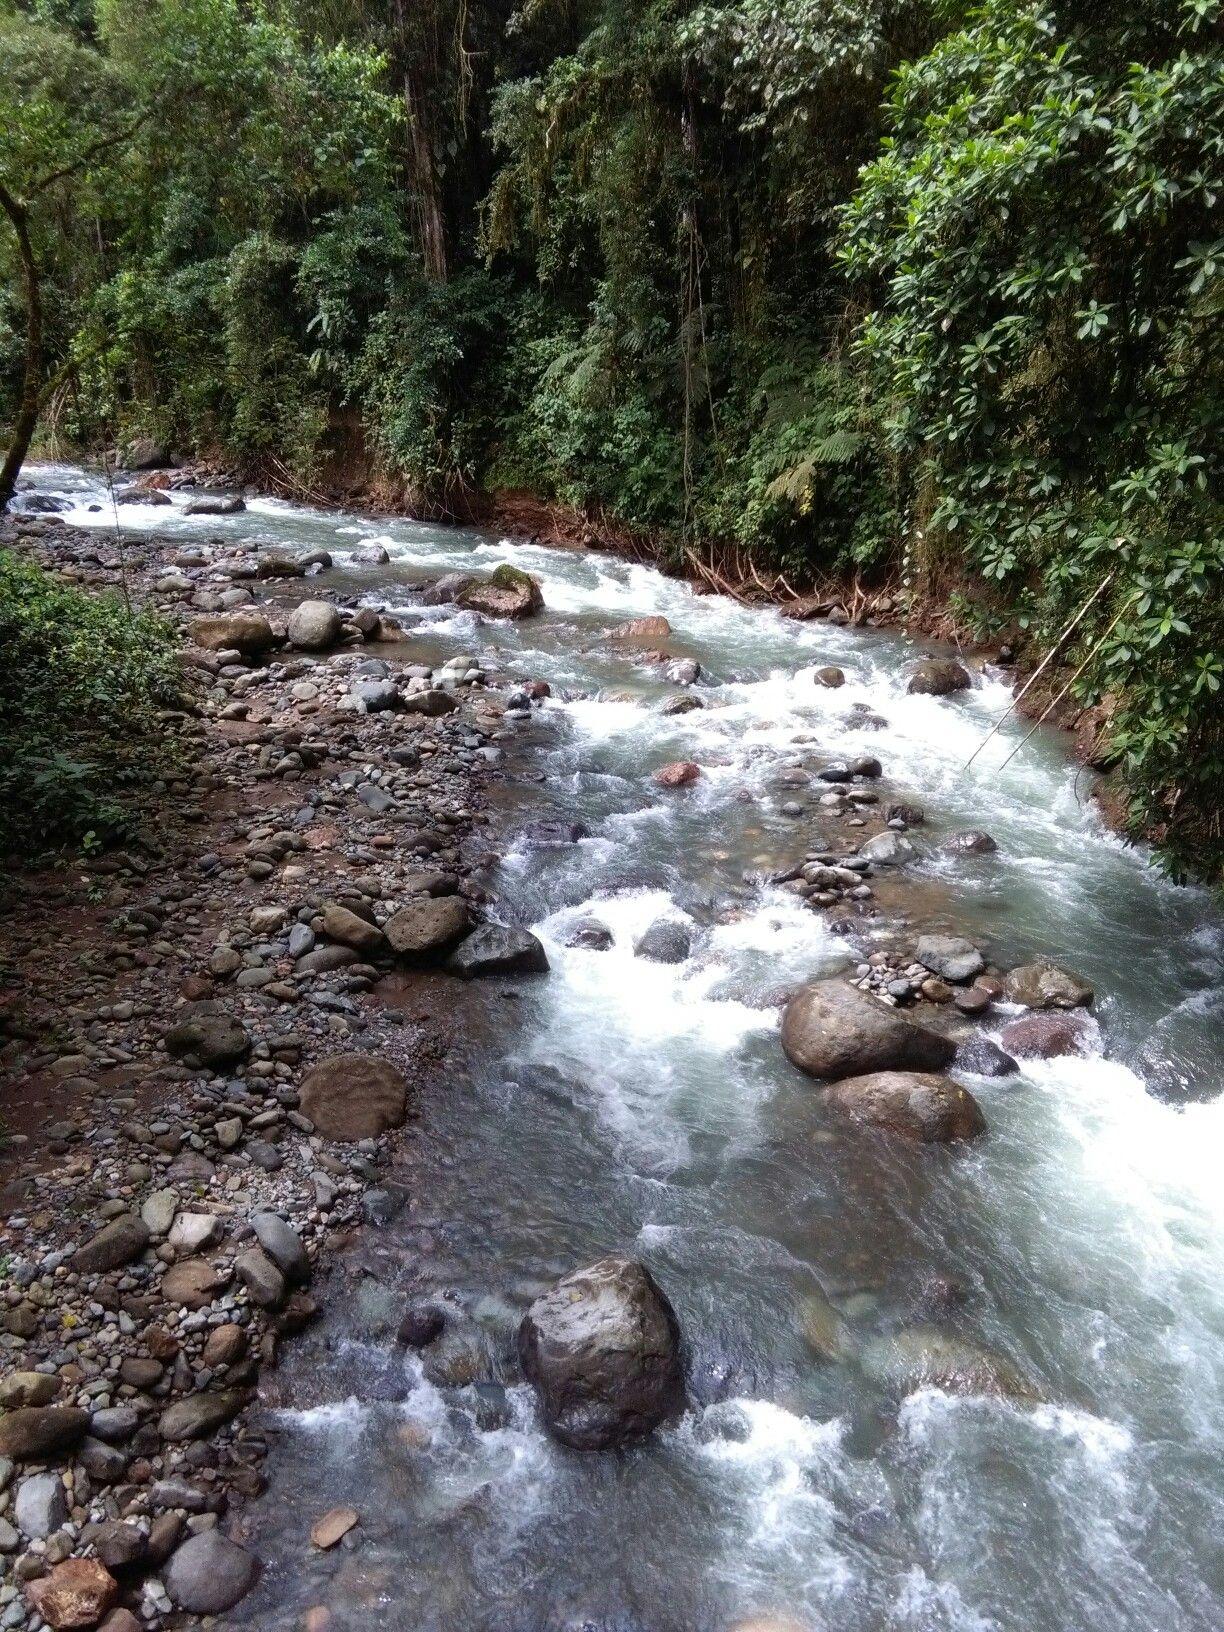 Refugio de vida silvestre la Marta, Costa Rica.